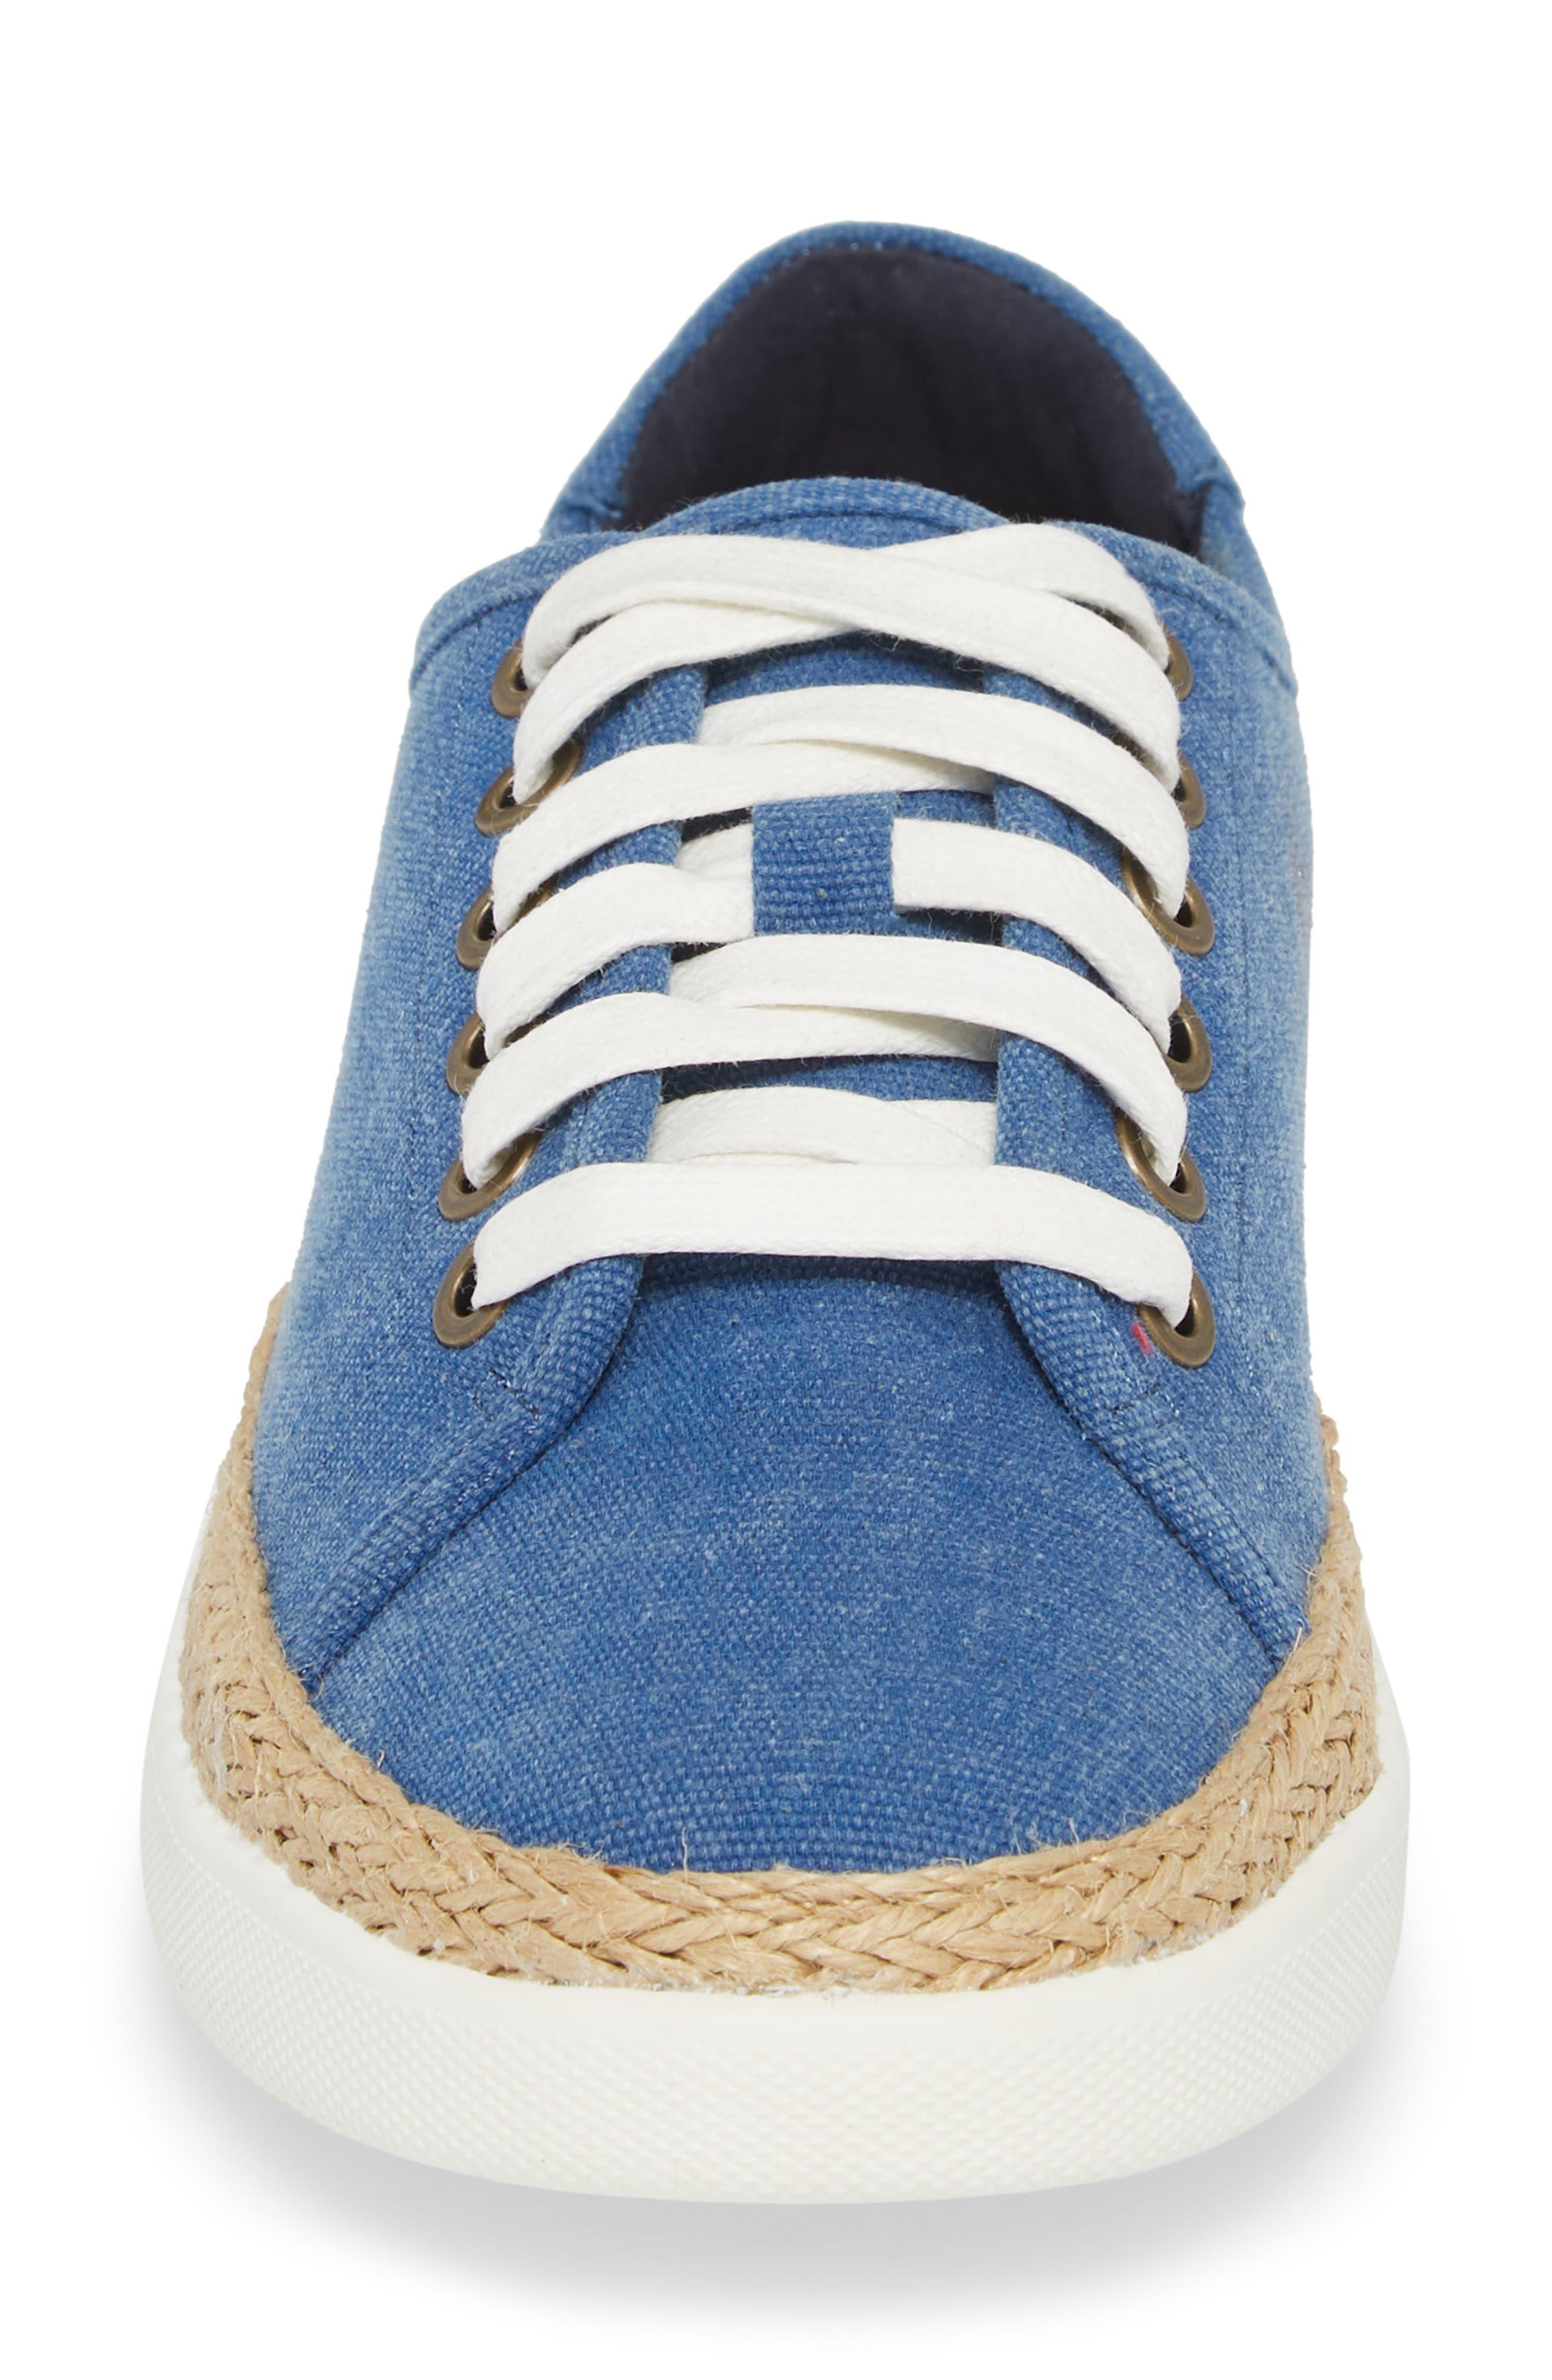 Hattie Sneaker,                             Alternate thumbnail 15, color,